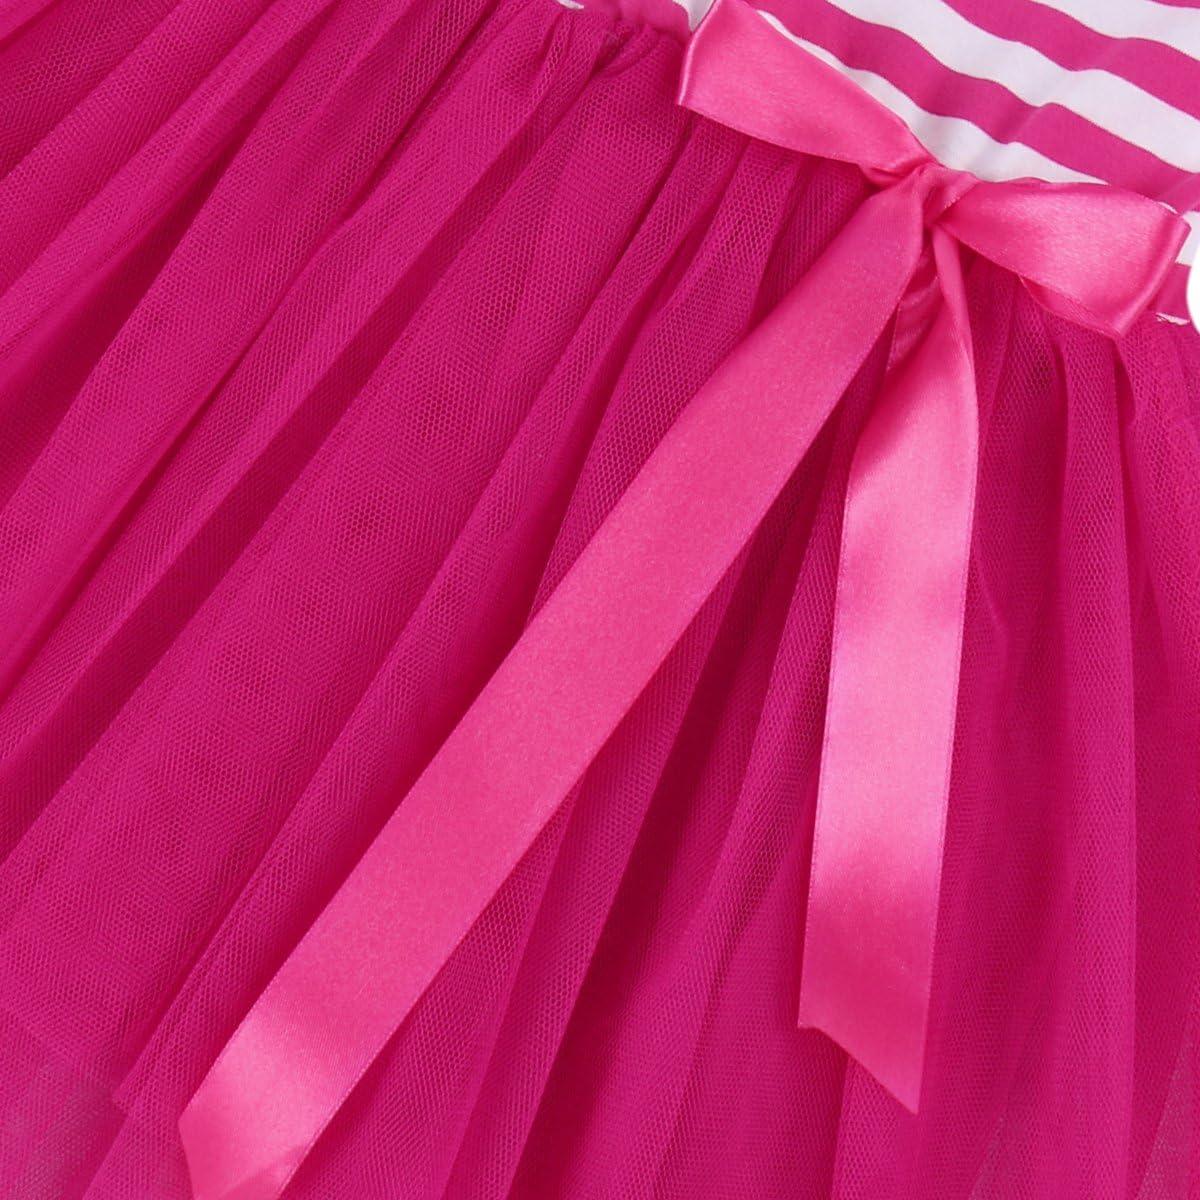 IMEKIS Baby Girls 1st//2nd//3rd Birthday Dress Cake Smash Outfit Long Sleeve Skirt